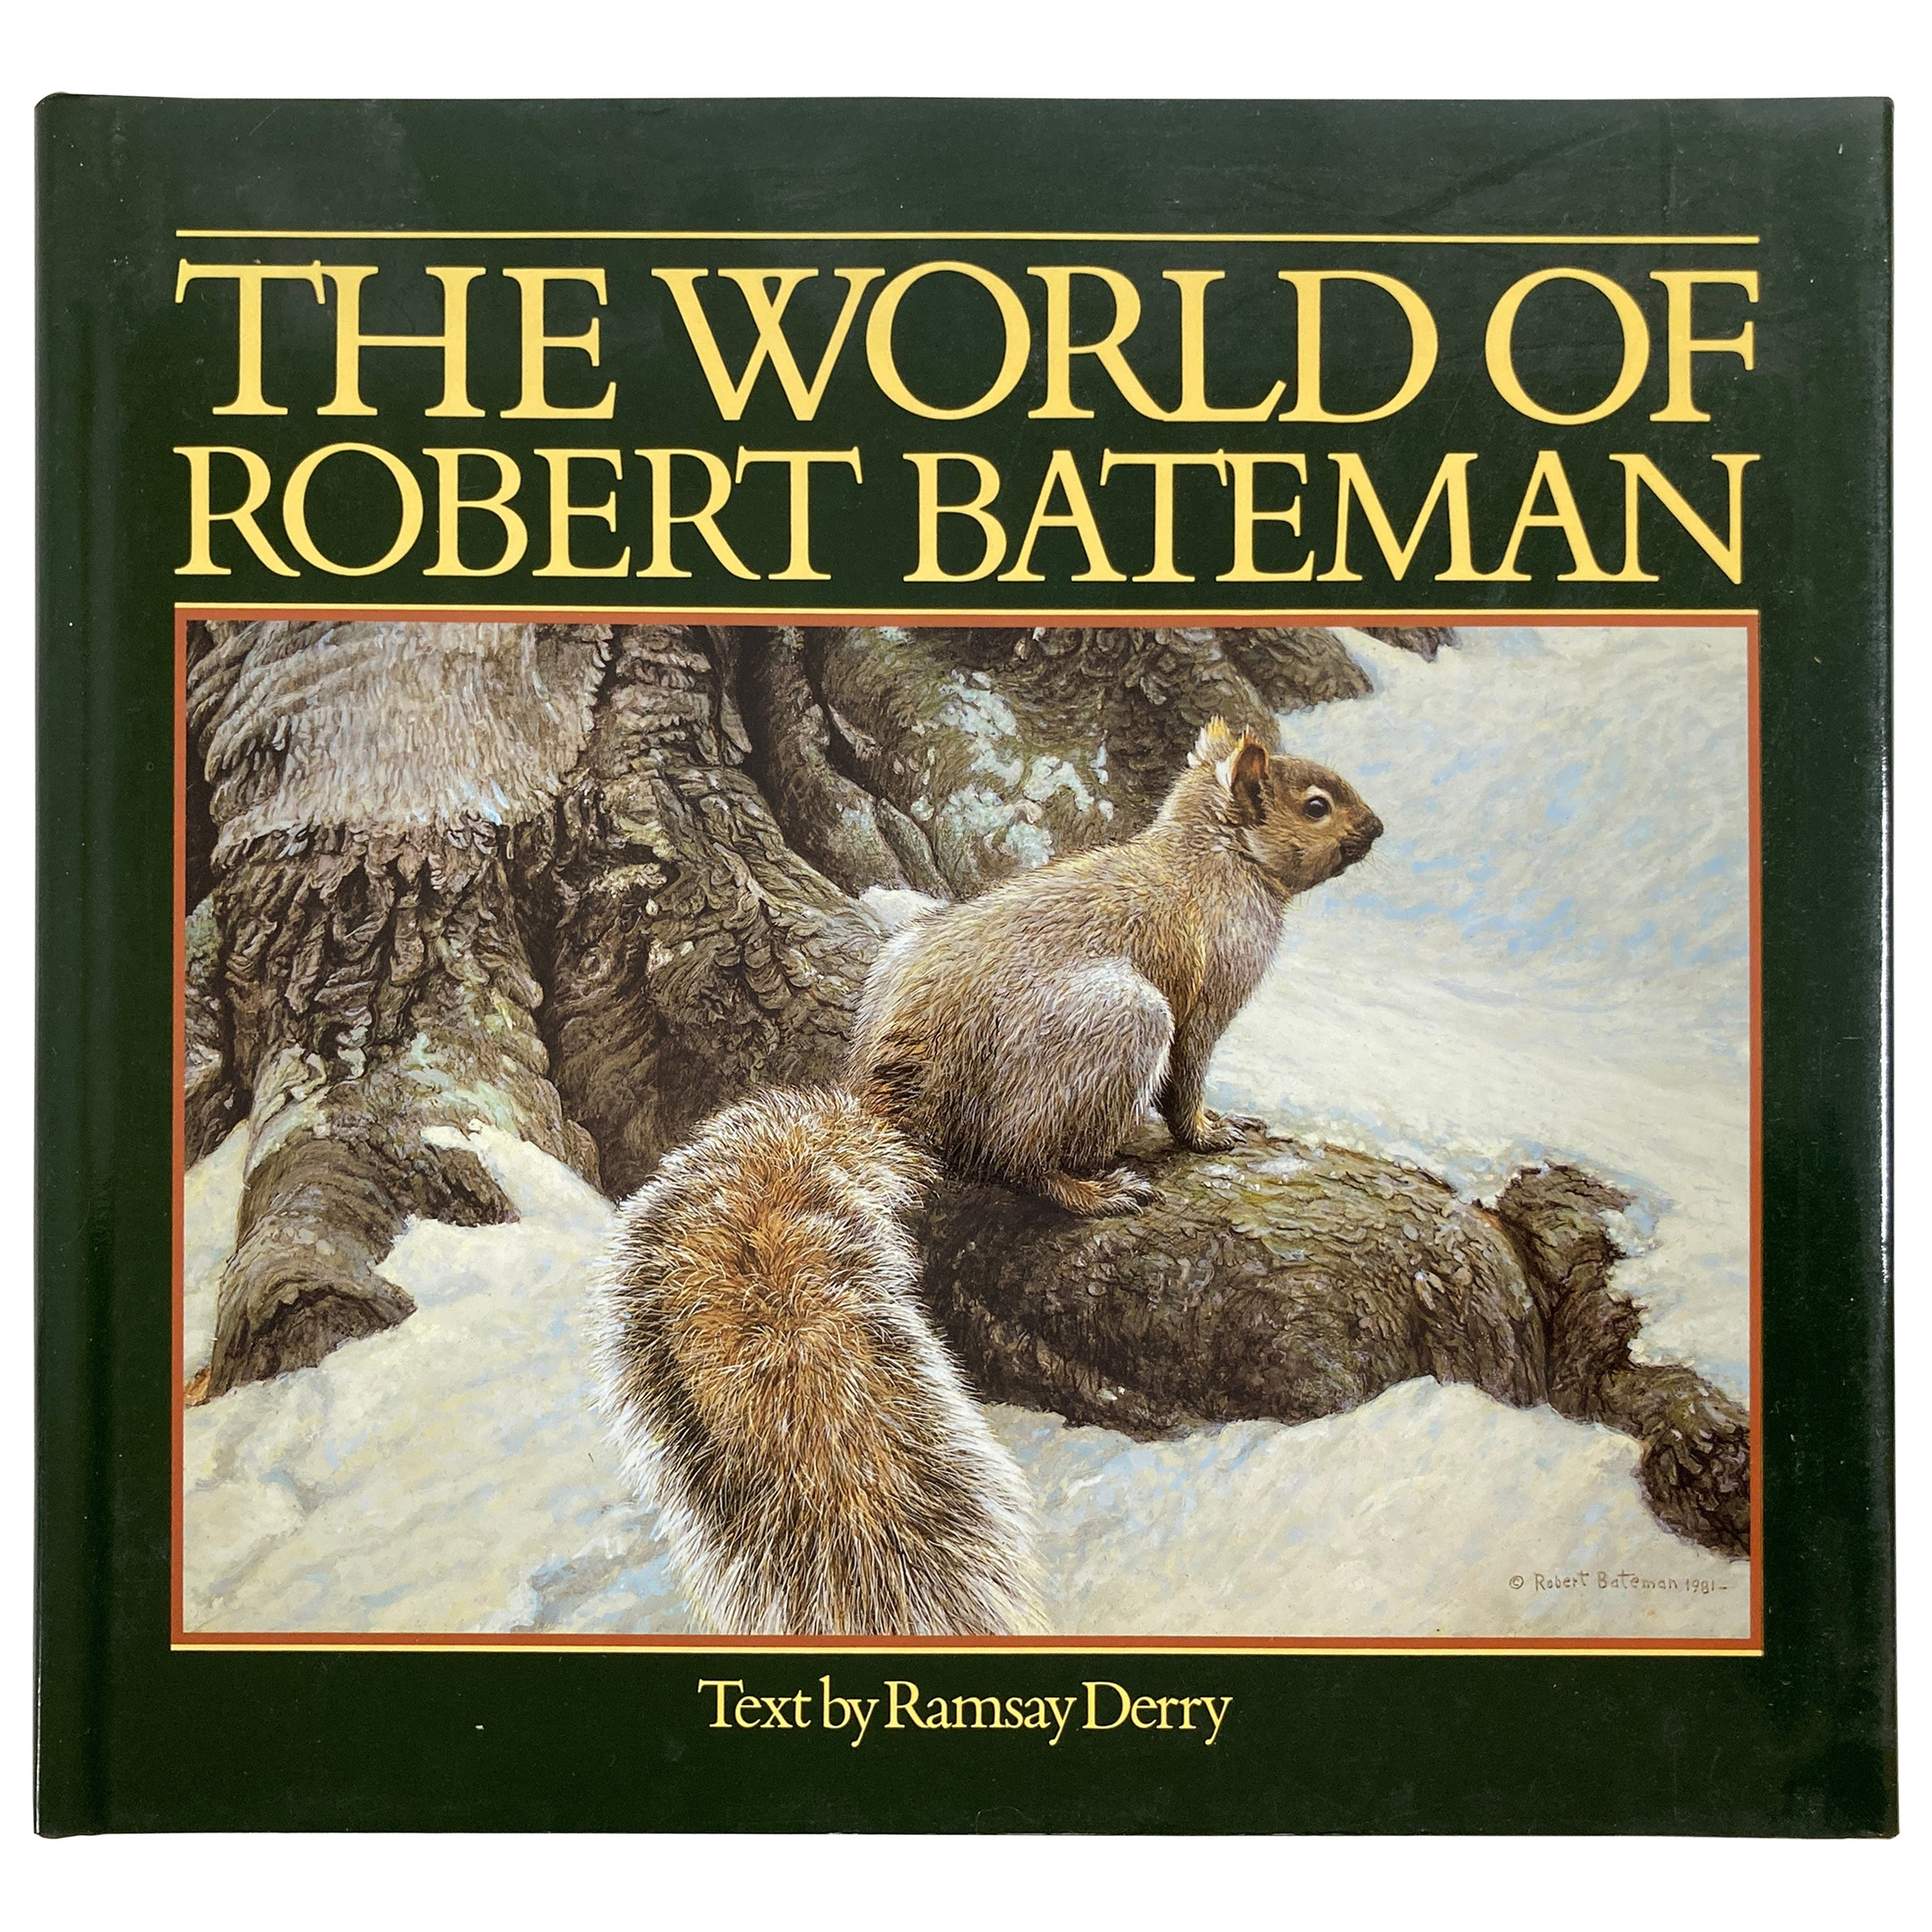 The World of Robert Bateman Hardcover Book